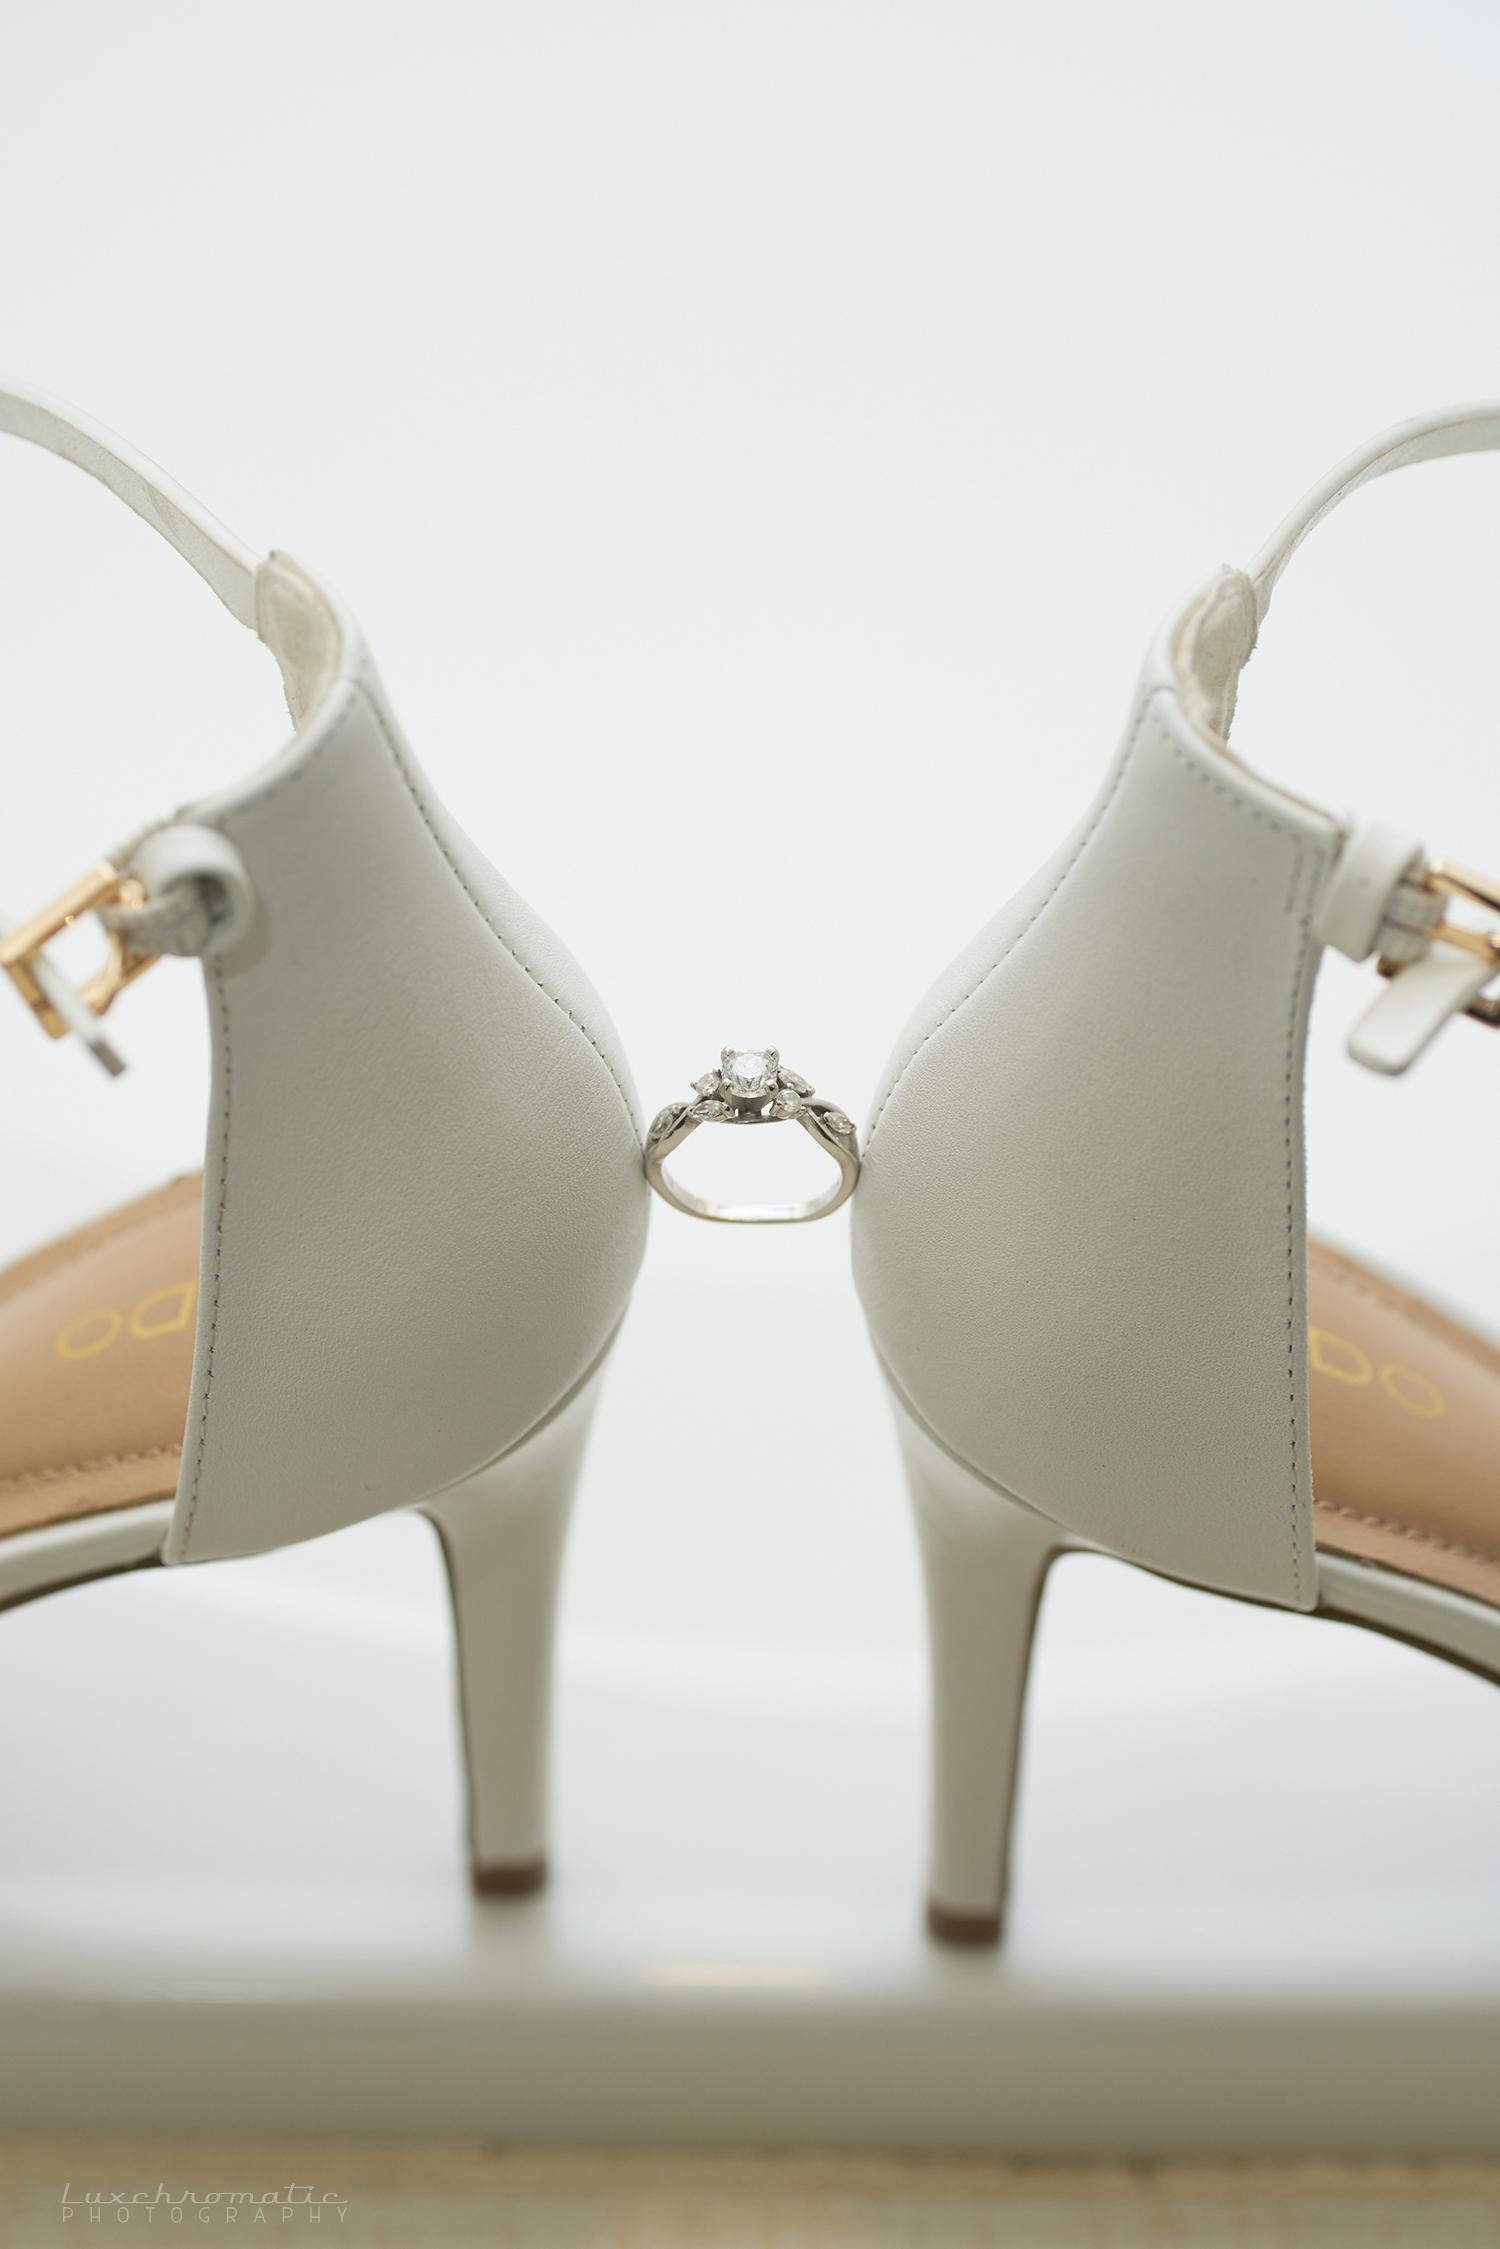 081217_Rachel_Chris_a0042-weddingdress-bride-weddingphotography-weddingphotographer-bridal-groom-wedding-engagementring-proposal-brides-diamondring-sonyalpha-sony-sonya9-sonya7rii-sanfrancisco-sf-bayarea-photographer-profoto-murrietas-well.jpg